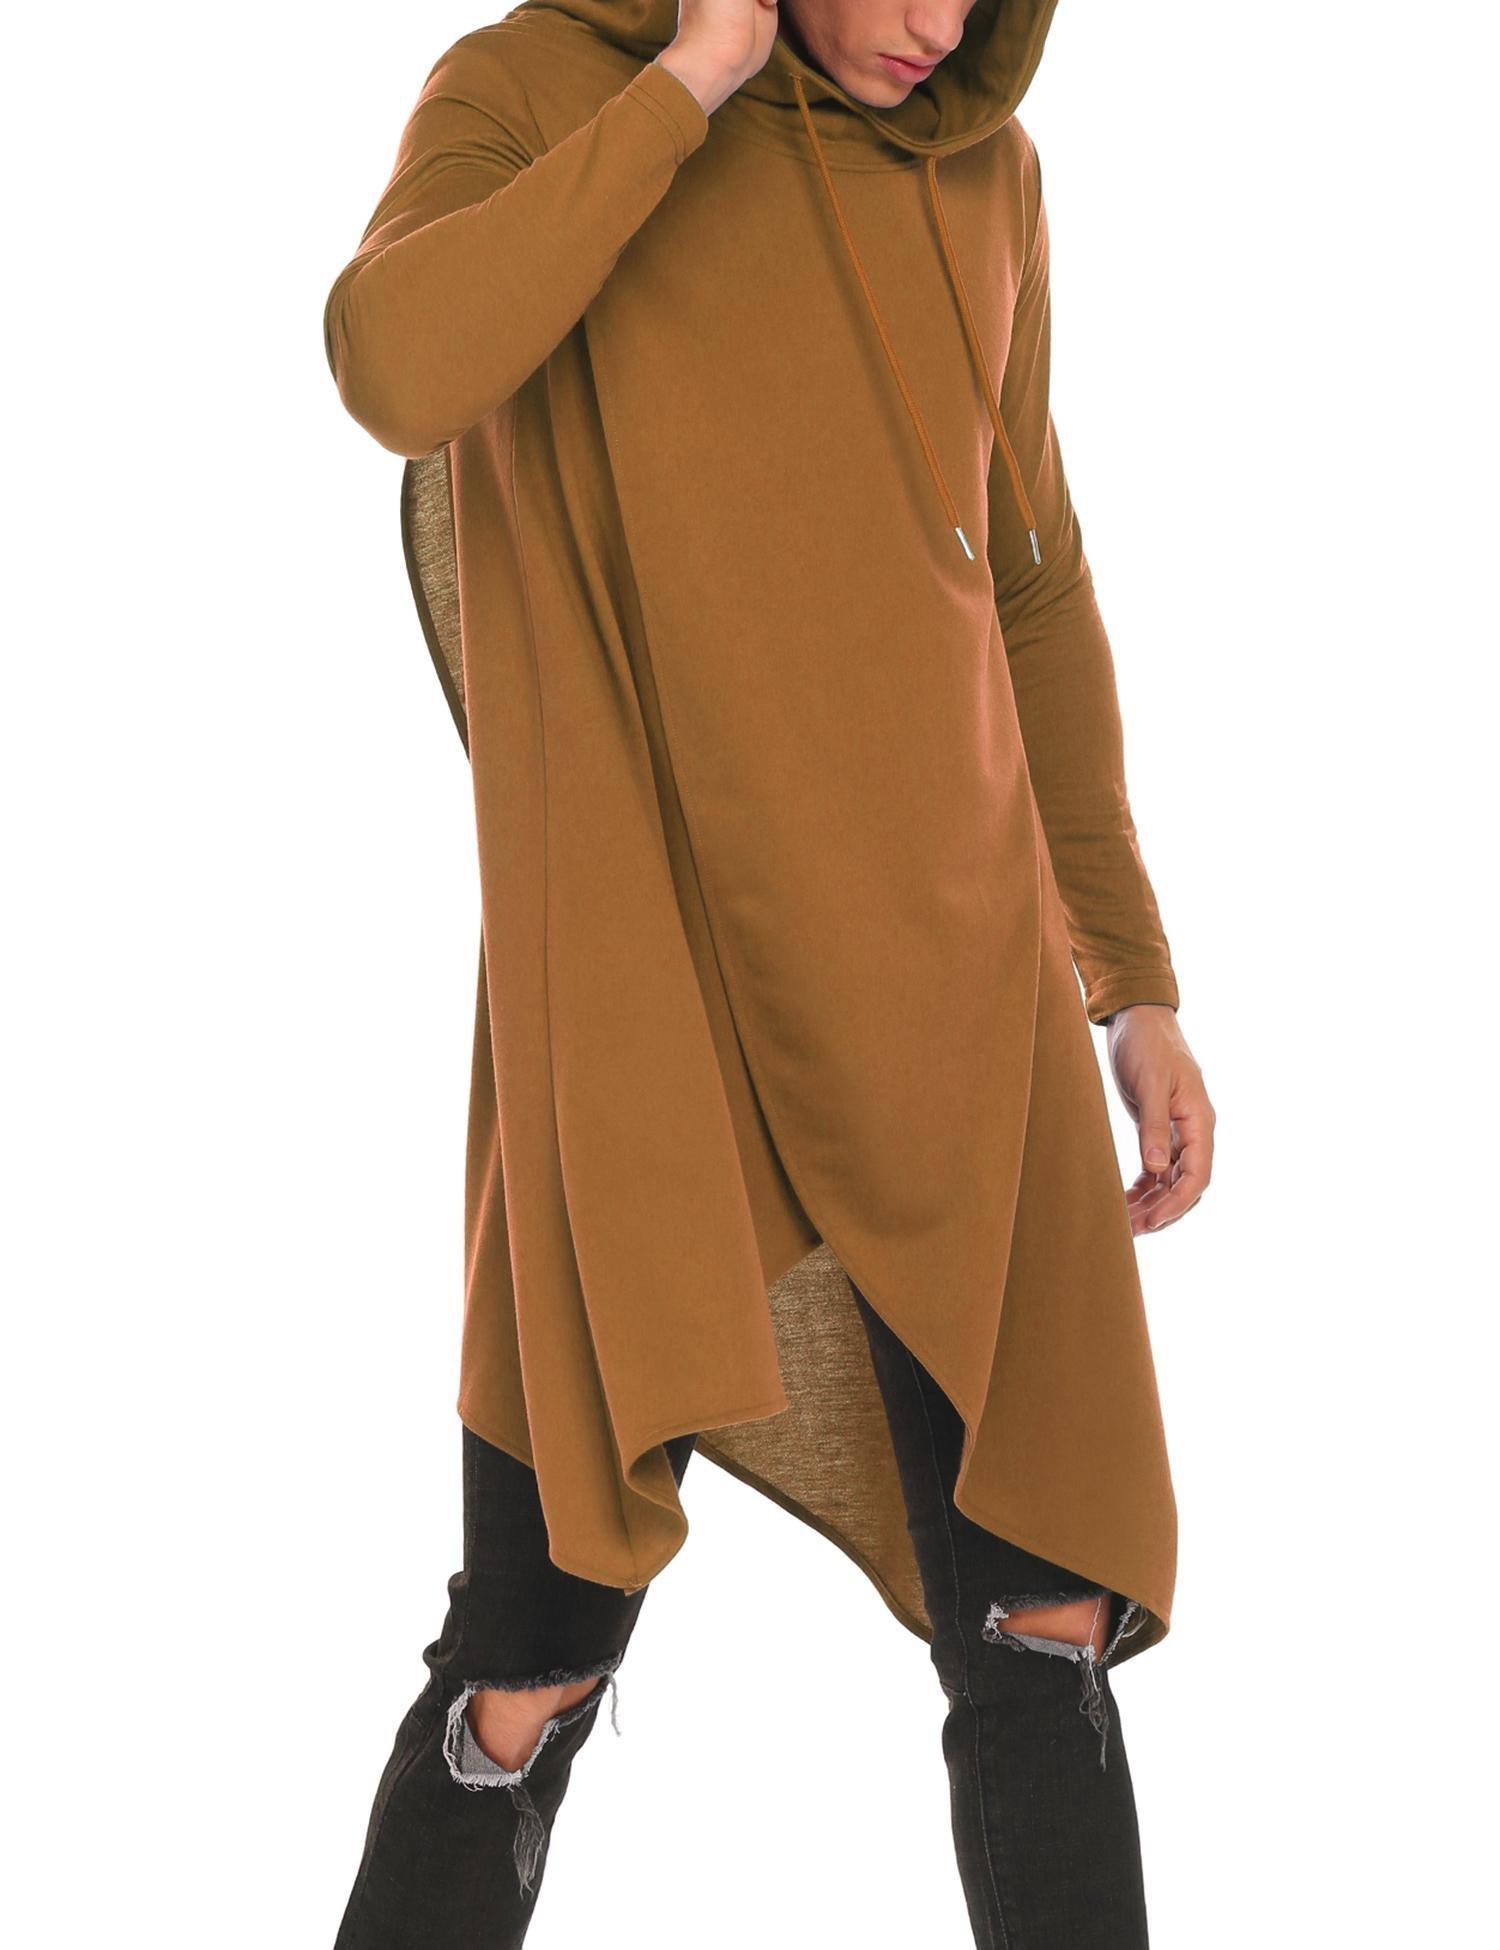 OOFANDY Mens Casual Hooded Poncho Cape Cloak Irregular Hem Hoodie Pullover,Coffee,Small